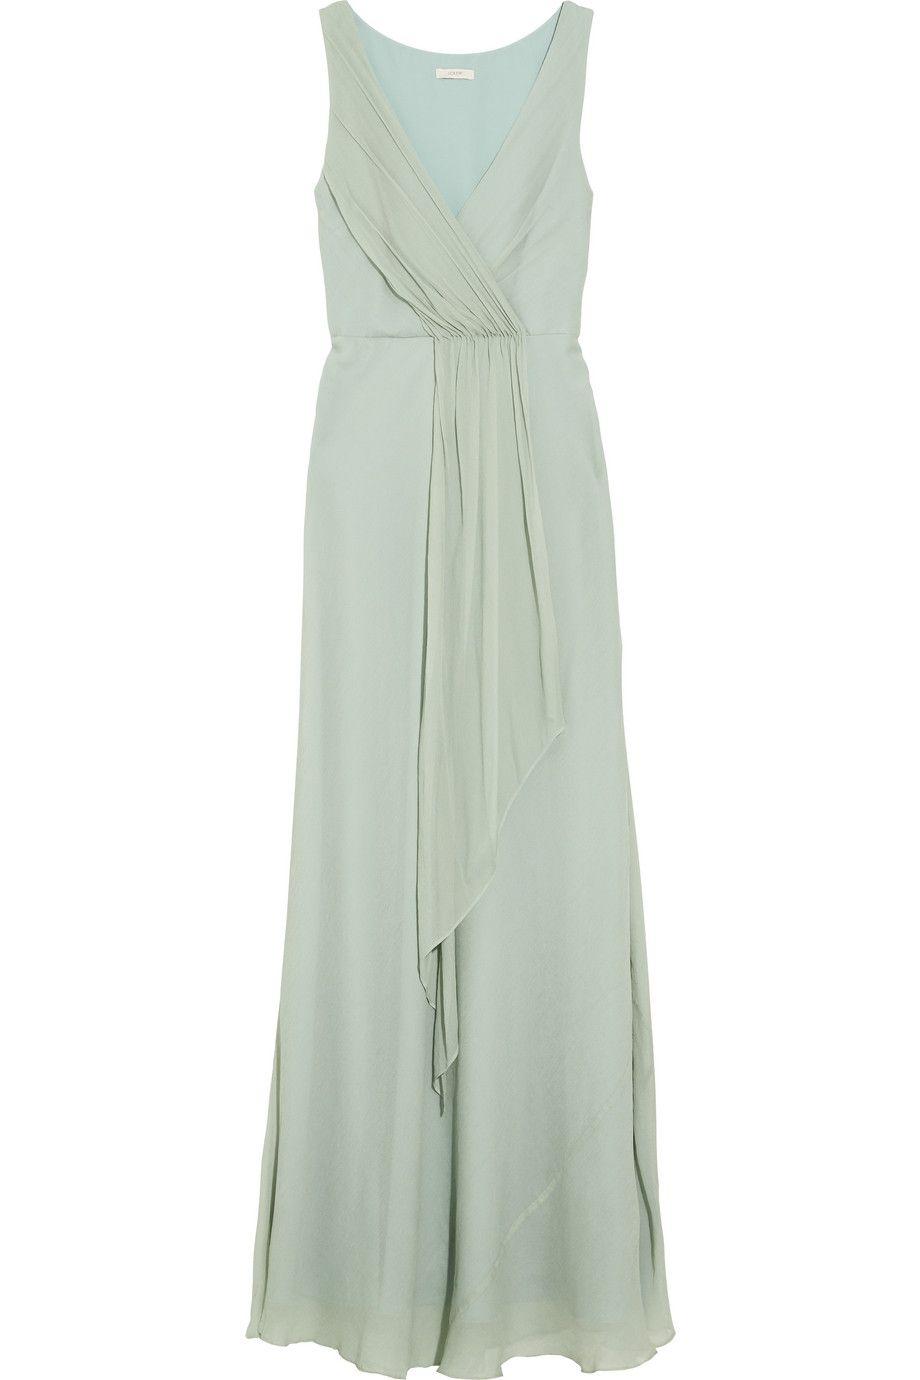 J.Crew | Evie draped silk-chiffon gown | NET-A-PORTER.COM | Costa ...